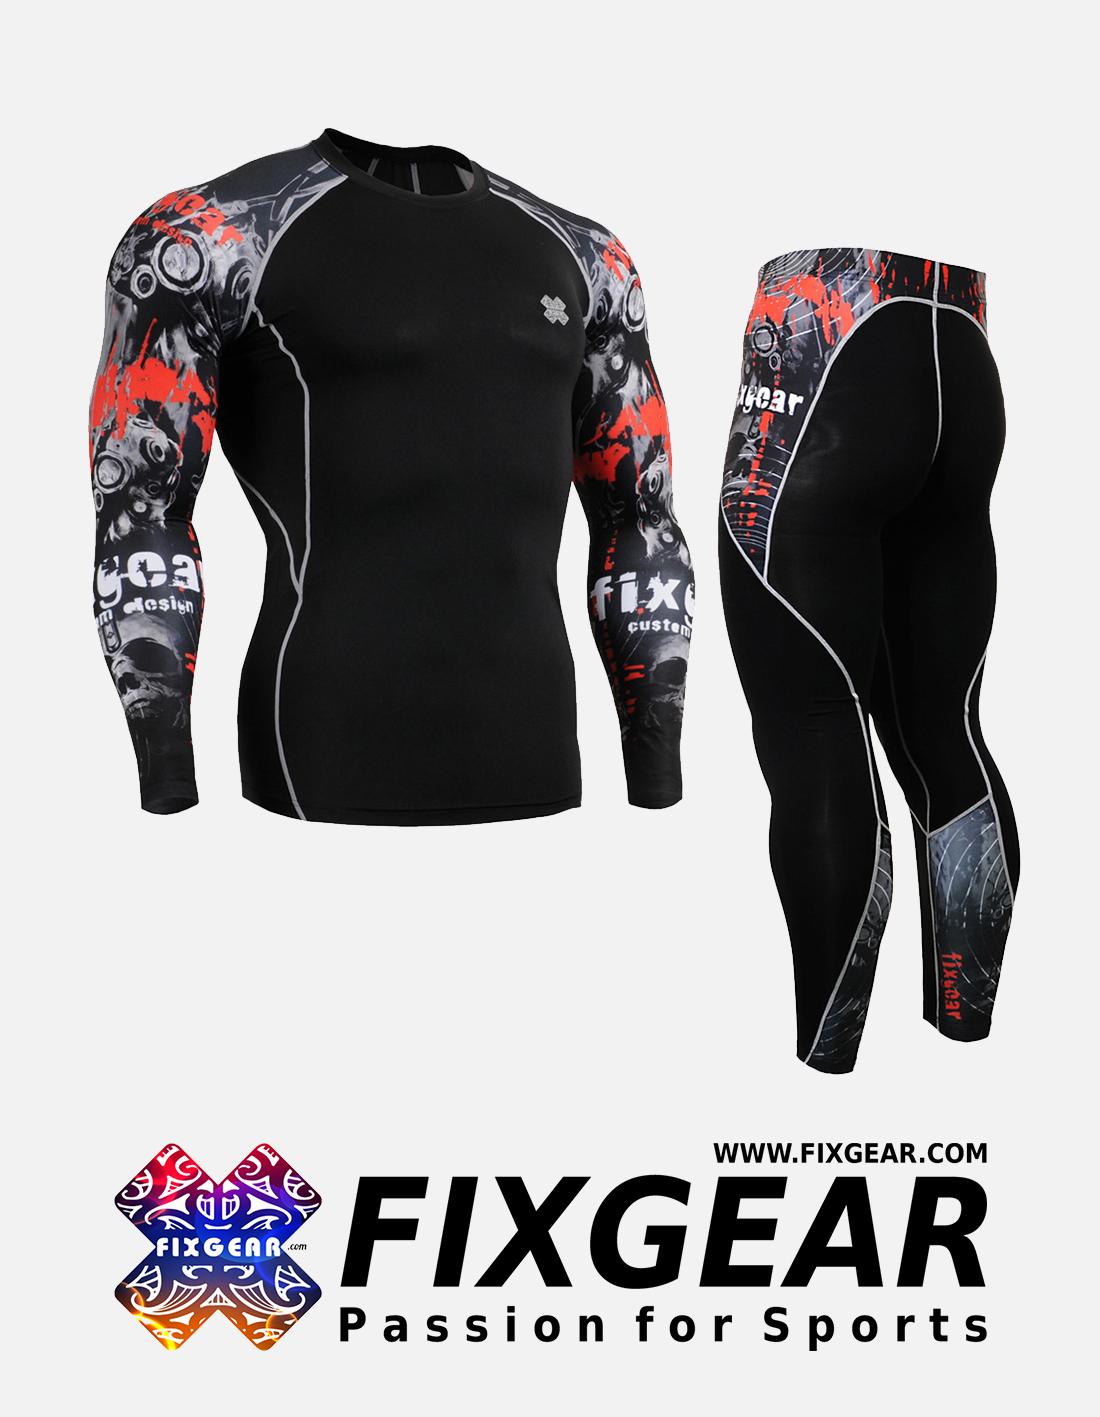 FIXGEAR CPD-P2L-B30 Set Compression Base Layer Shirt & Legging Pants